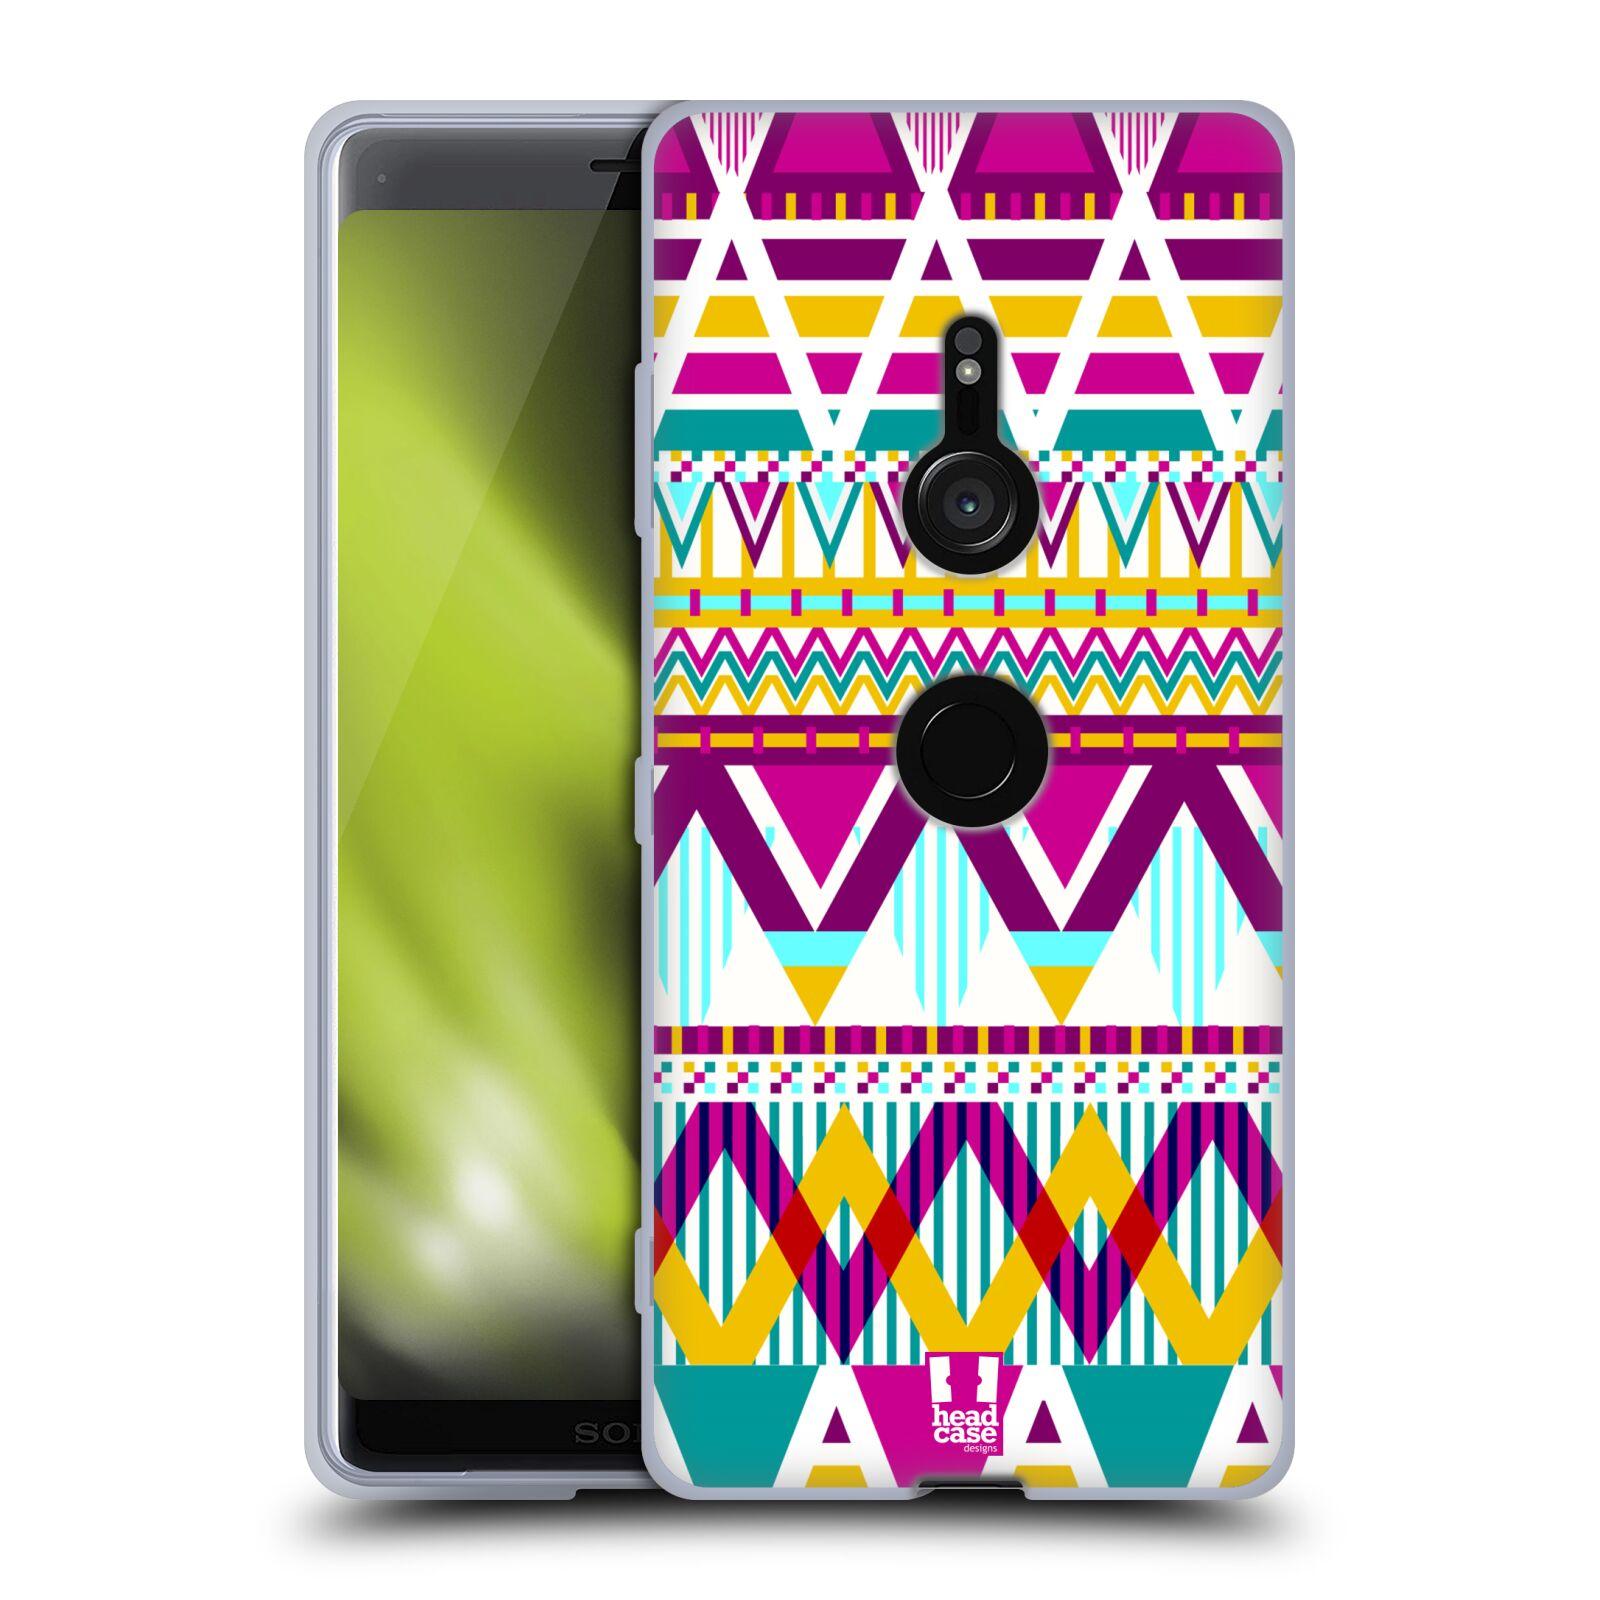 Silikonové pouzdro na mobil Sony Xperia XZ3 - Head Case - AZTEC SUGARED